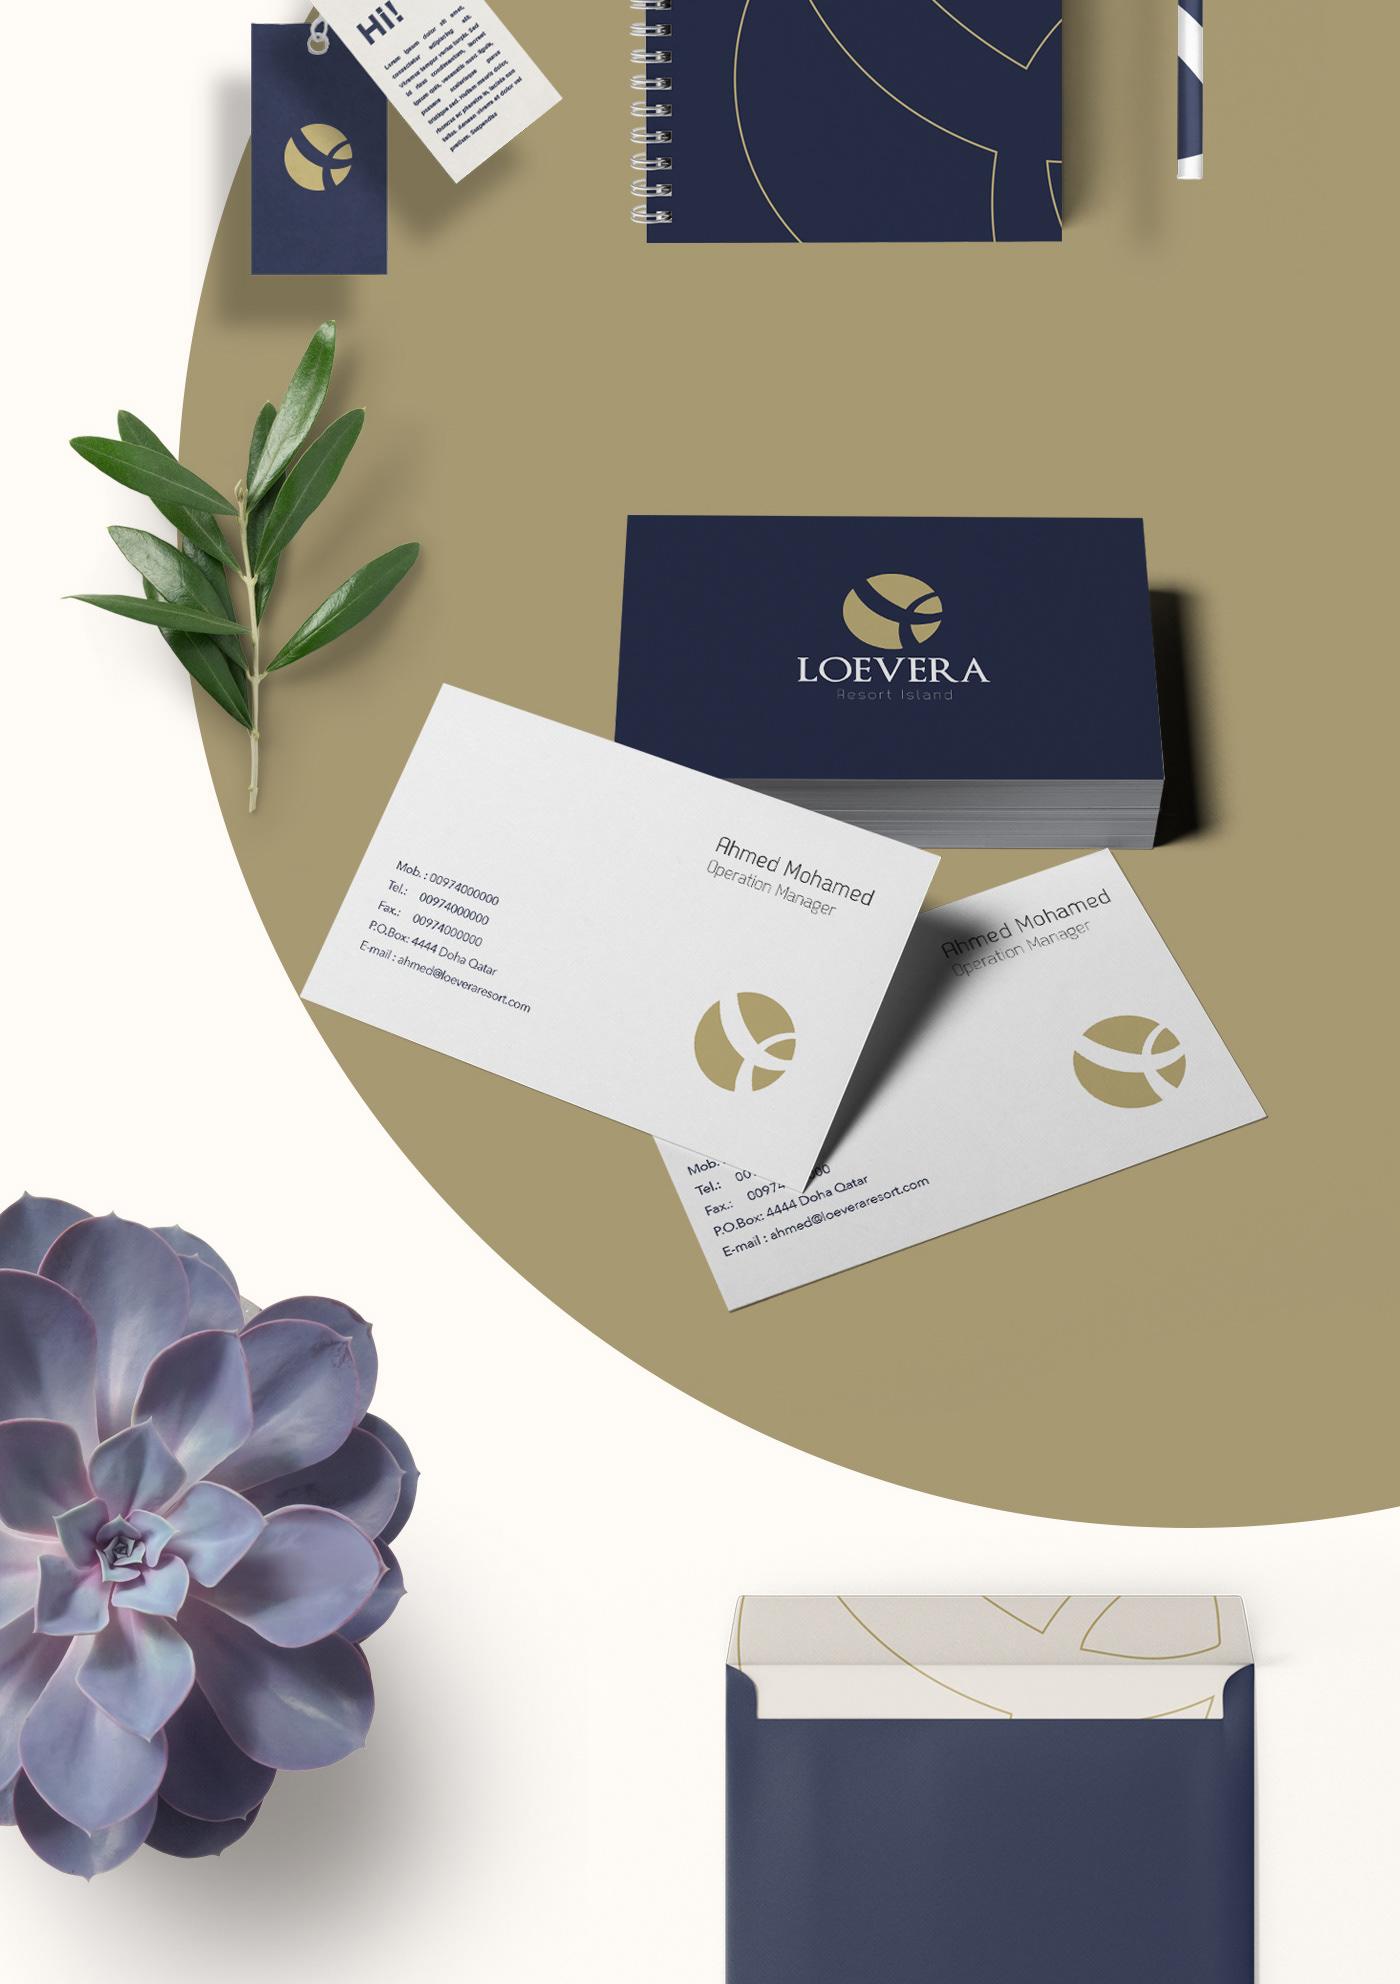 resort doha Qatar branding  logo identity dubai Greece hotel KSA